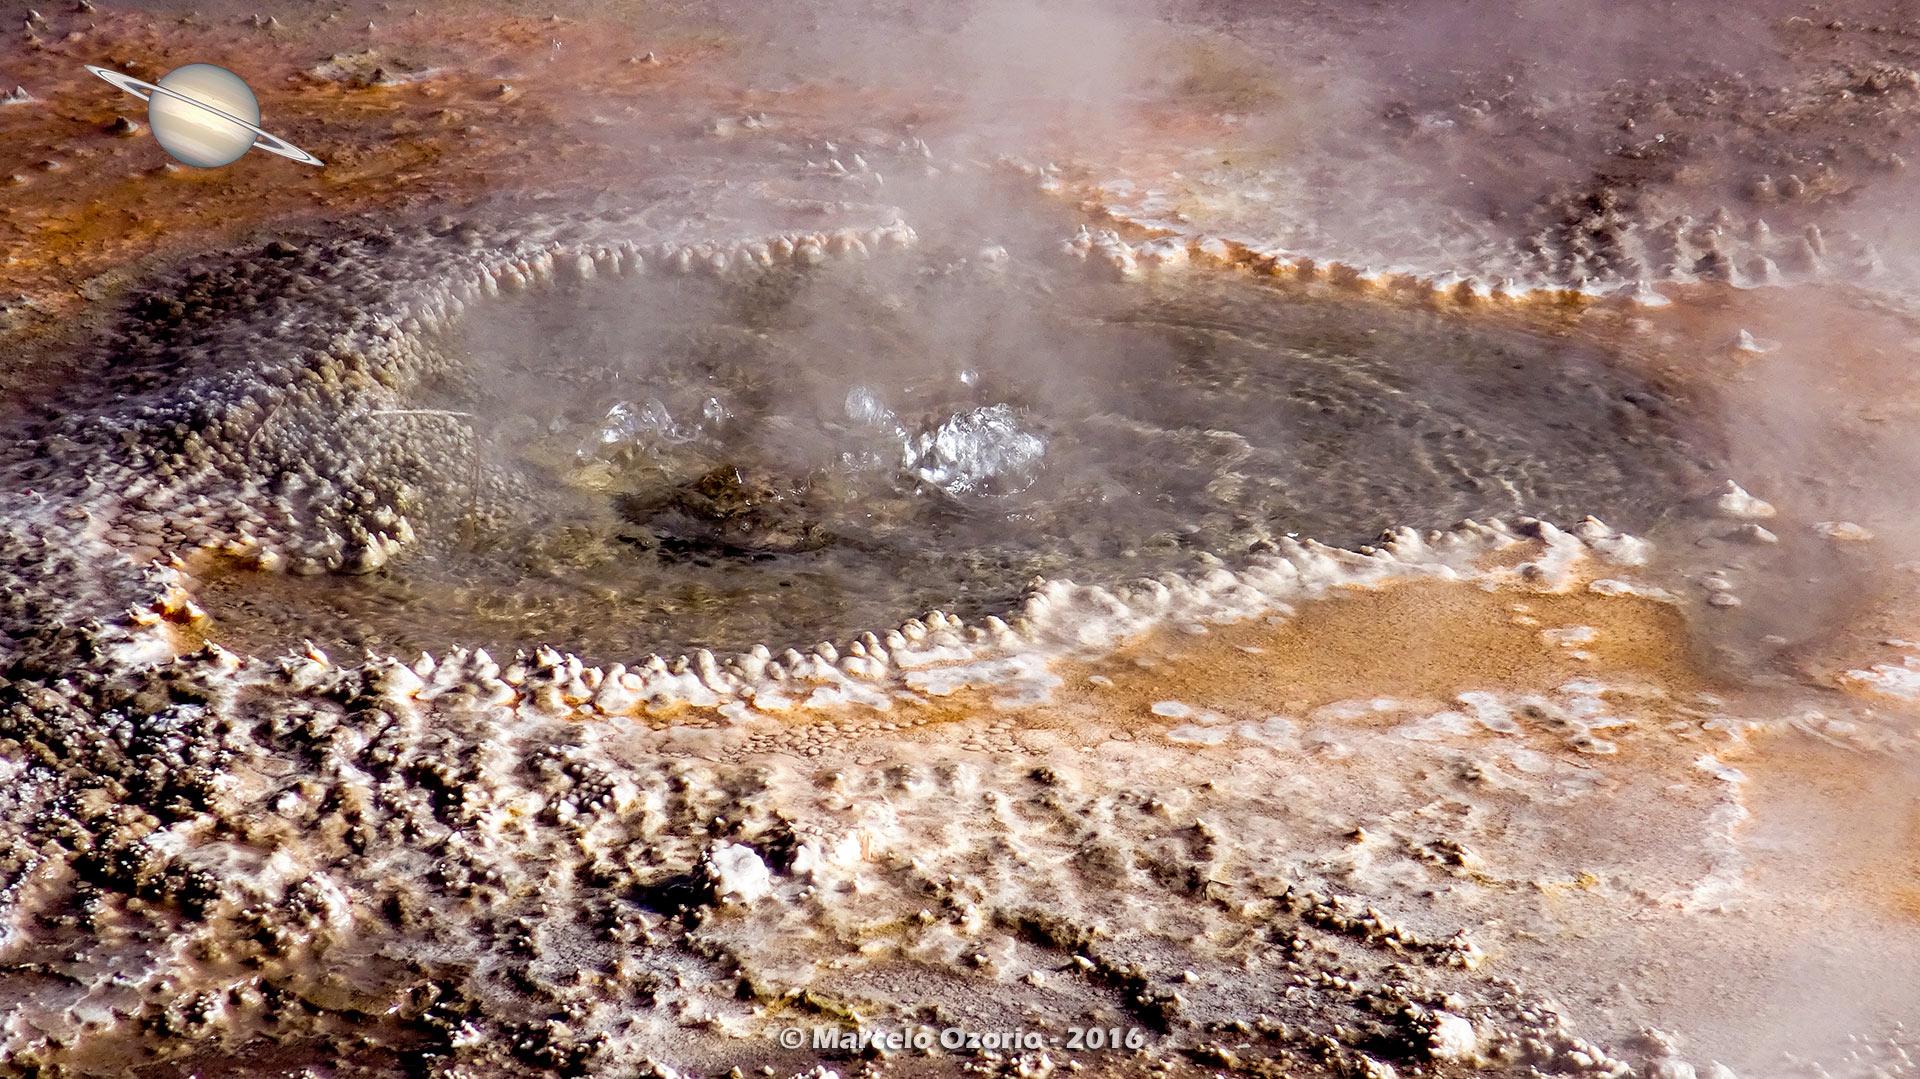 el tatio geysers atacama desert 37 - Os Surreais Gêiseres El Tatio - Deserto do Atacama - Chile